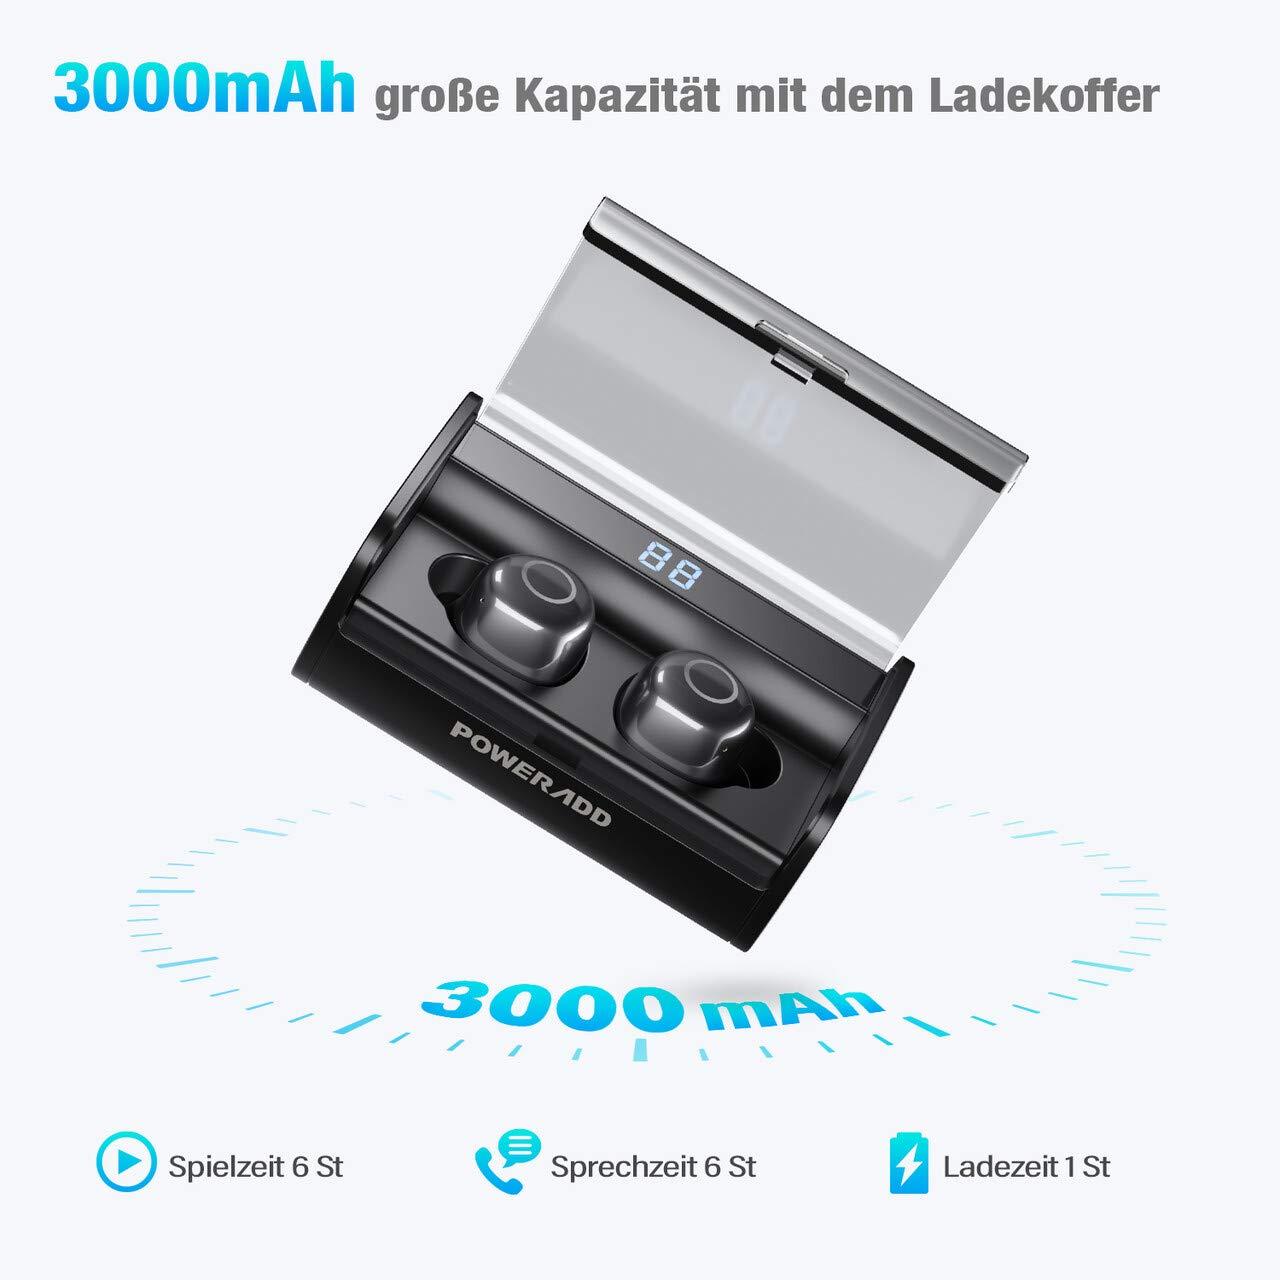 POWERADD 3000mAh Bluetooth Kopfhörer Sport Kopfhörer Bluetooth 5.0 In-Ear Ohrhörer mit CVC 6.0 IPX7 wasserdichter Grad und Integriertem Mikrofon